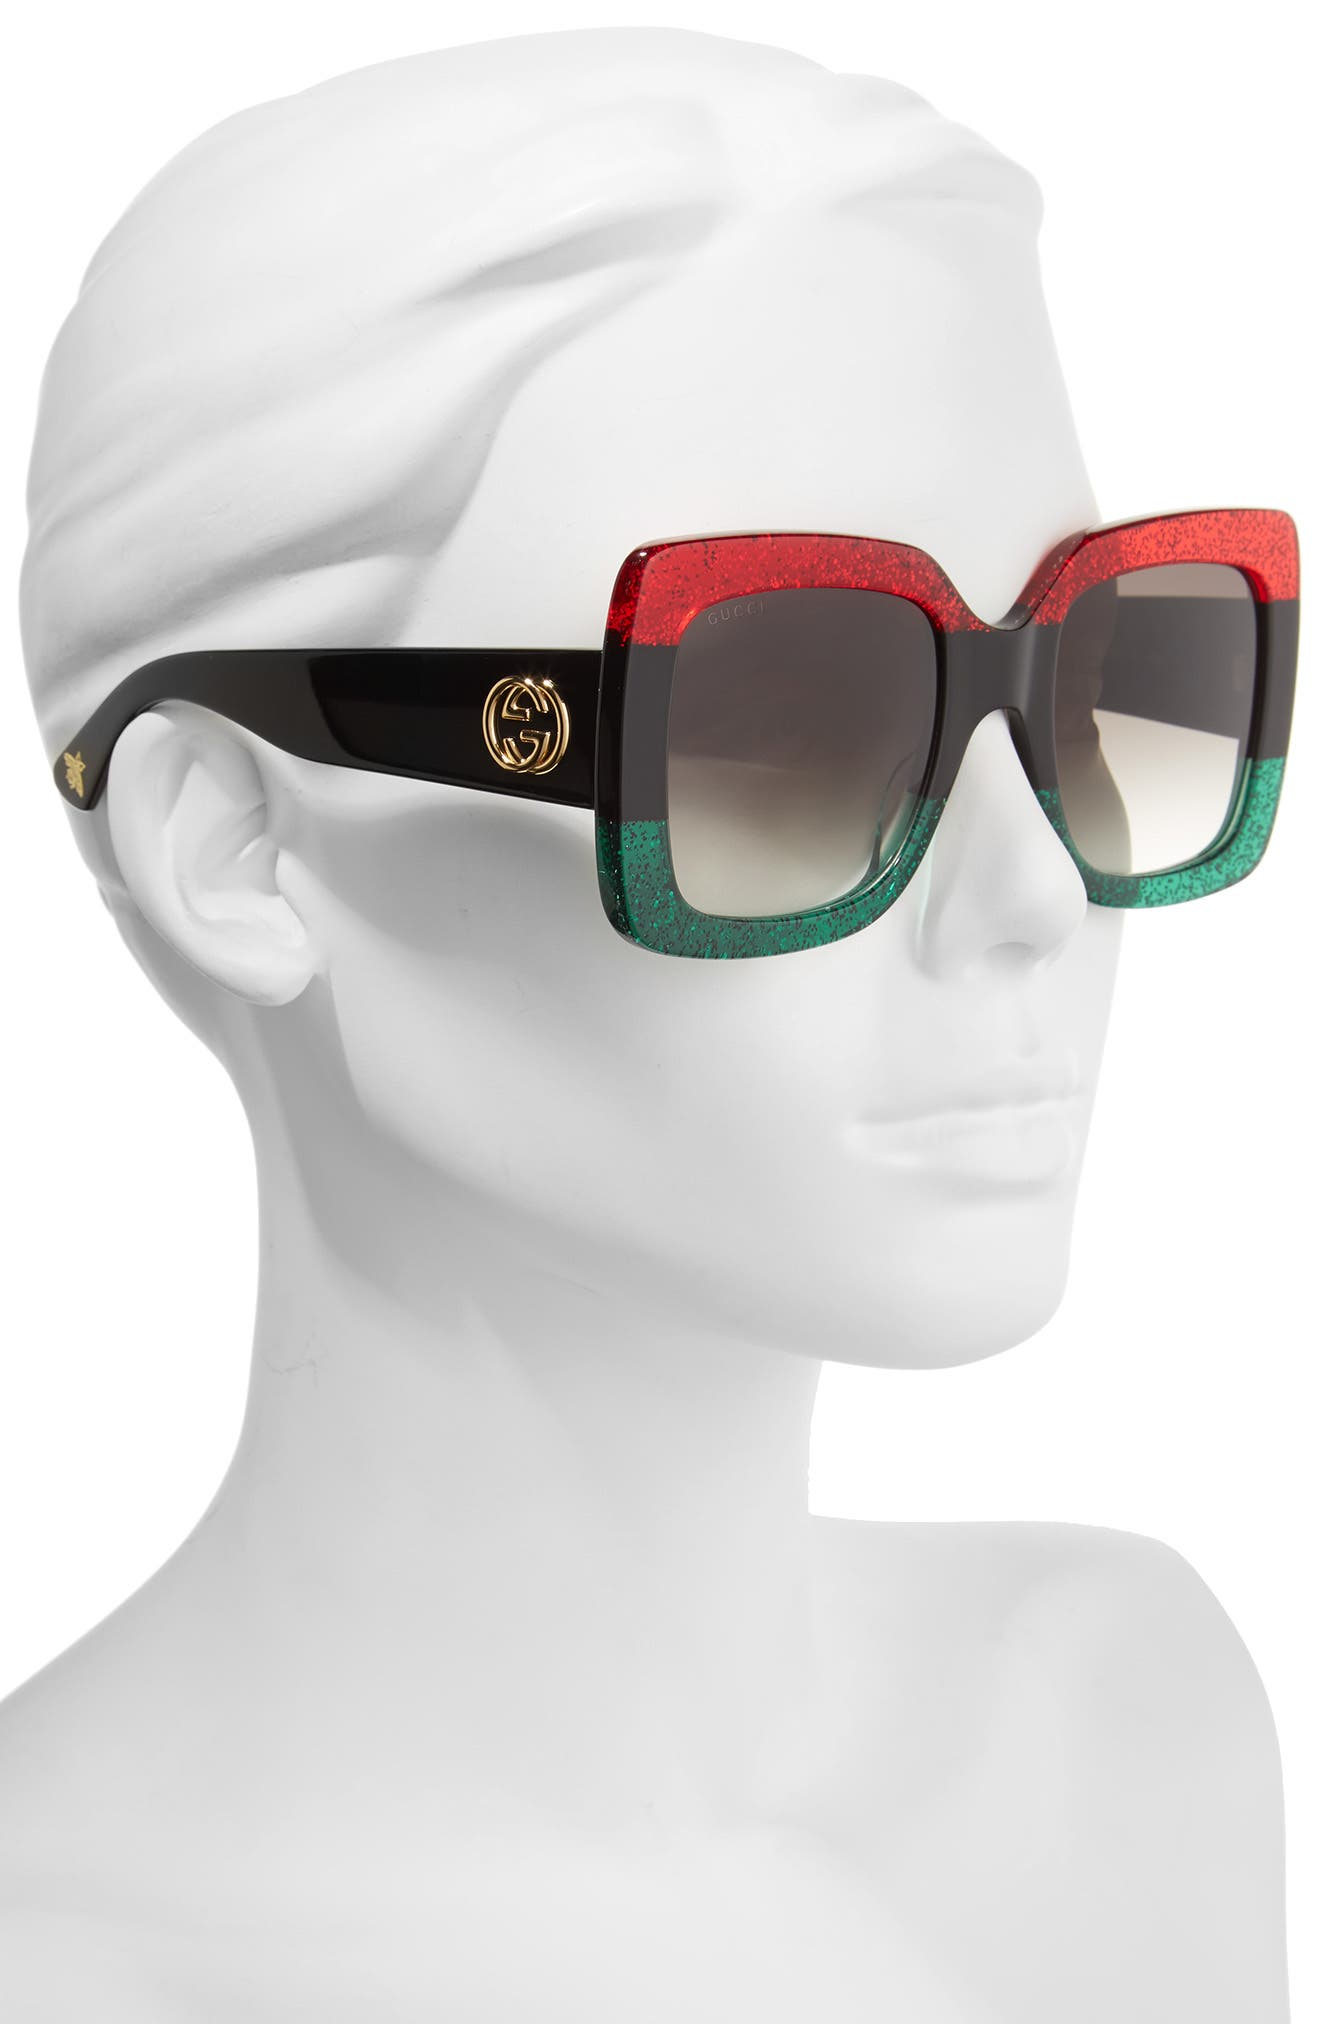 55mm Square Sunglasses,                             Alternate thumbnail 2, color,                             RED BLACK GREEN/ GREY